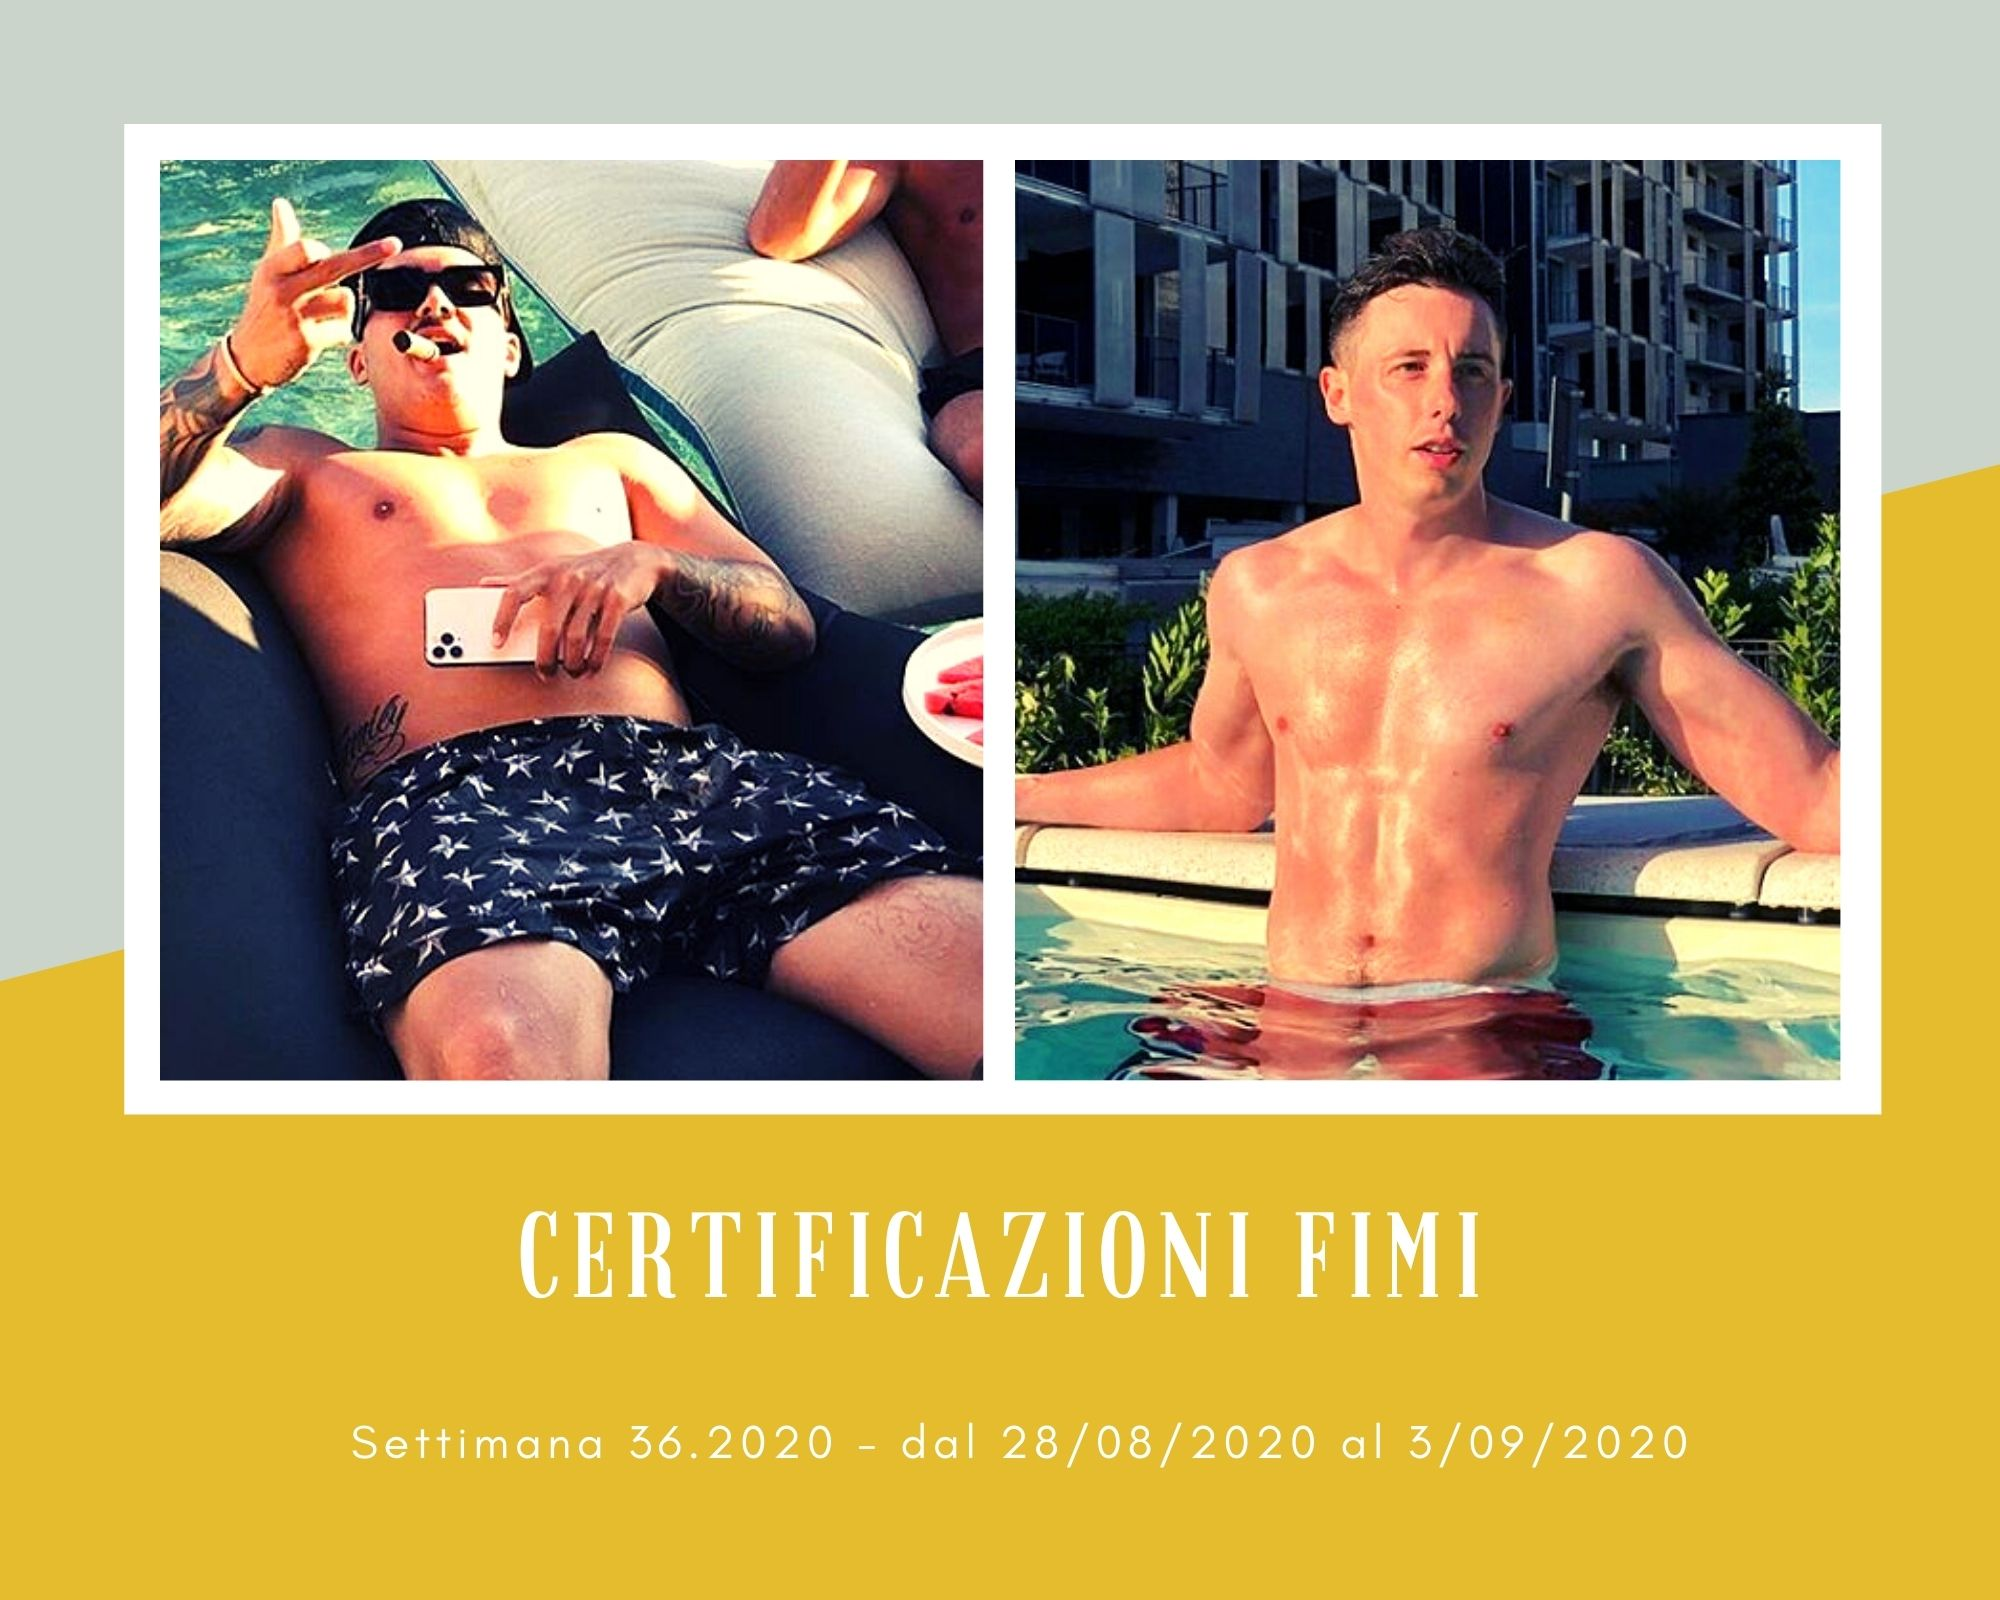 Certificazioni FIMI, week 36: Da Geolier a Shade, passando per Rocco Hunt. I rapper vendono di più